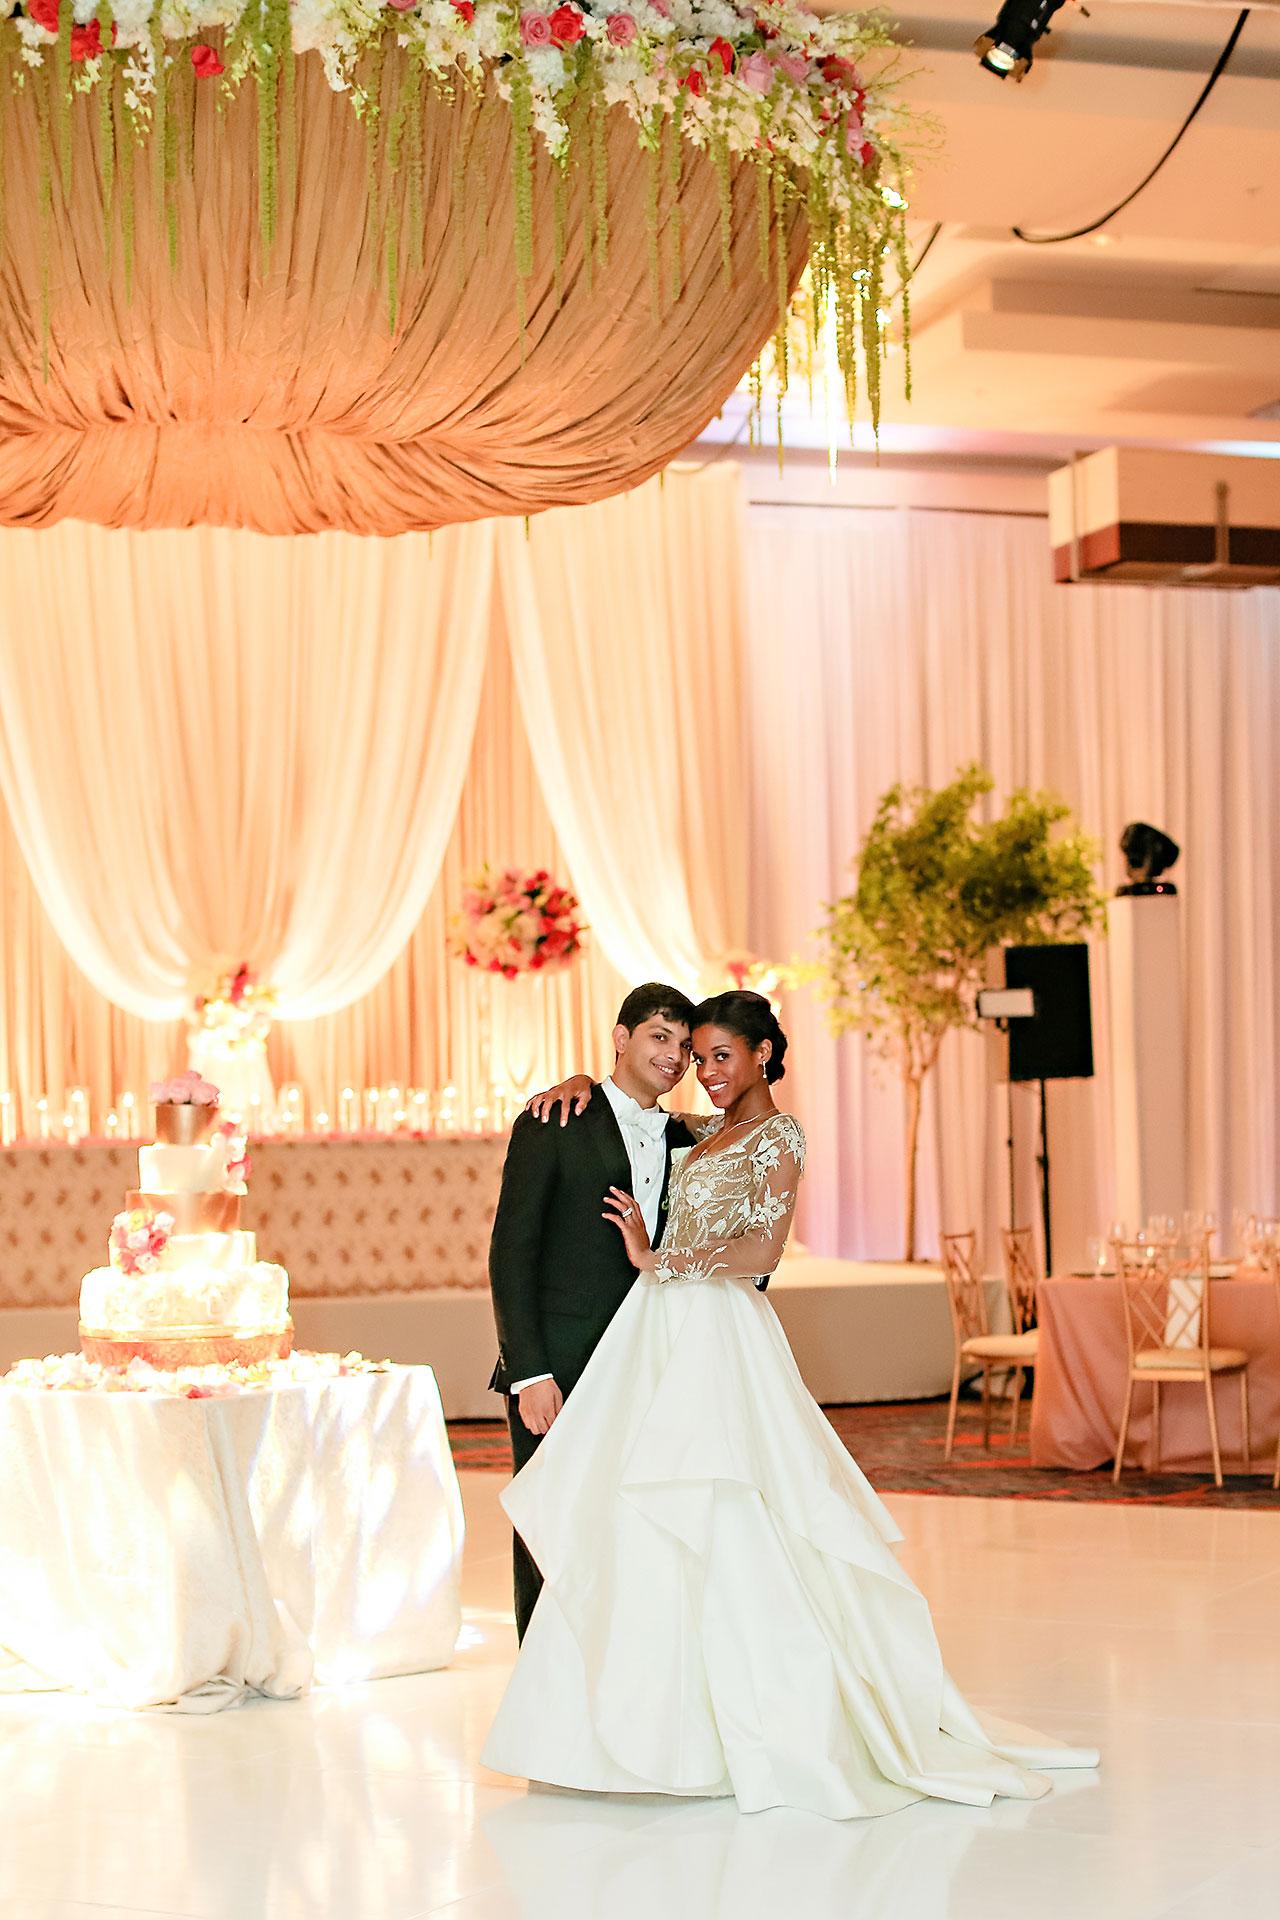 Joie Nikhil JW Marriott Indianapolis Wedding 001